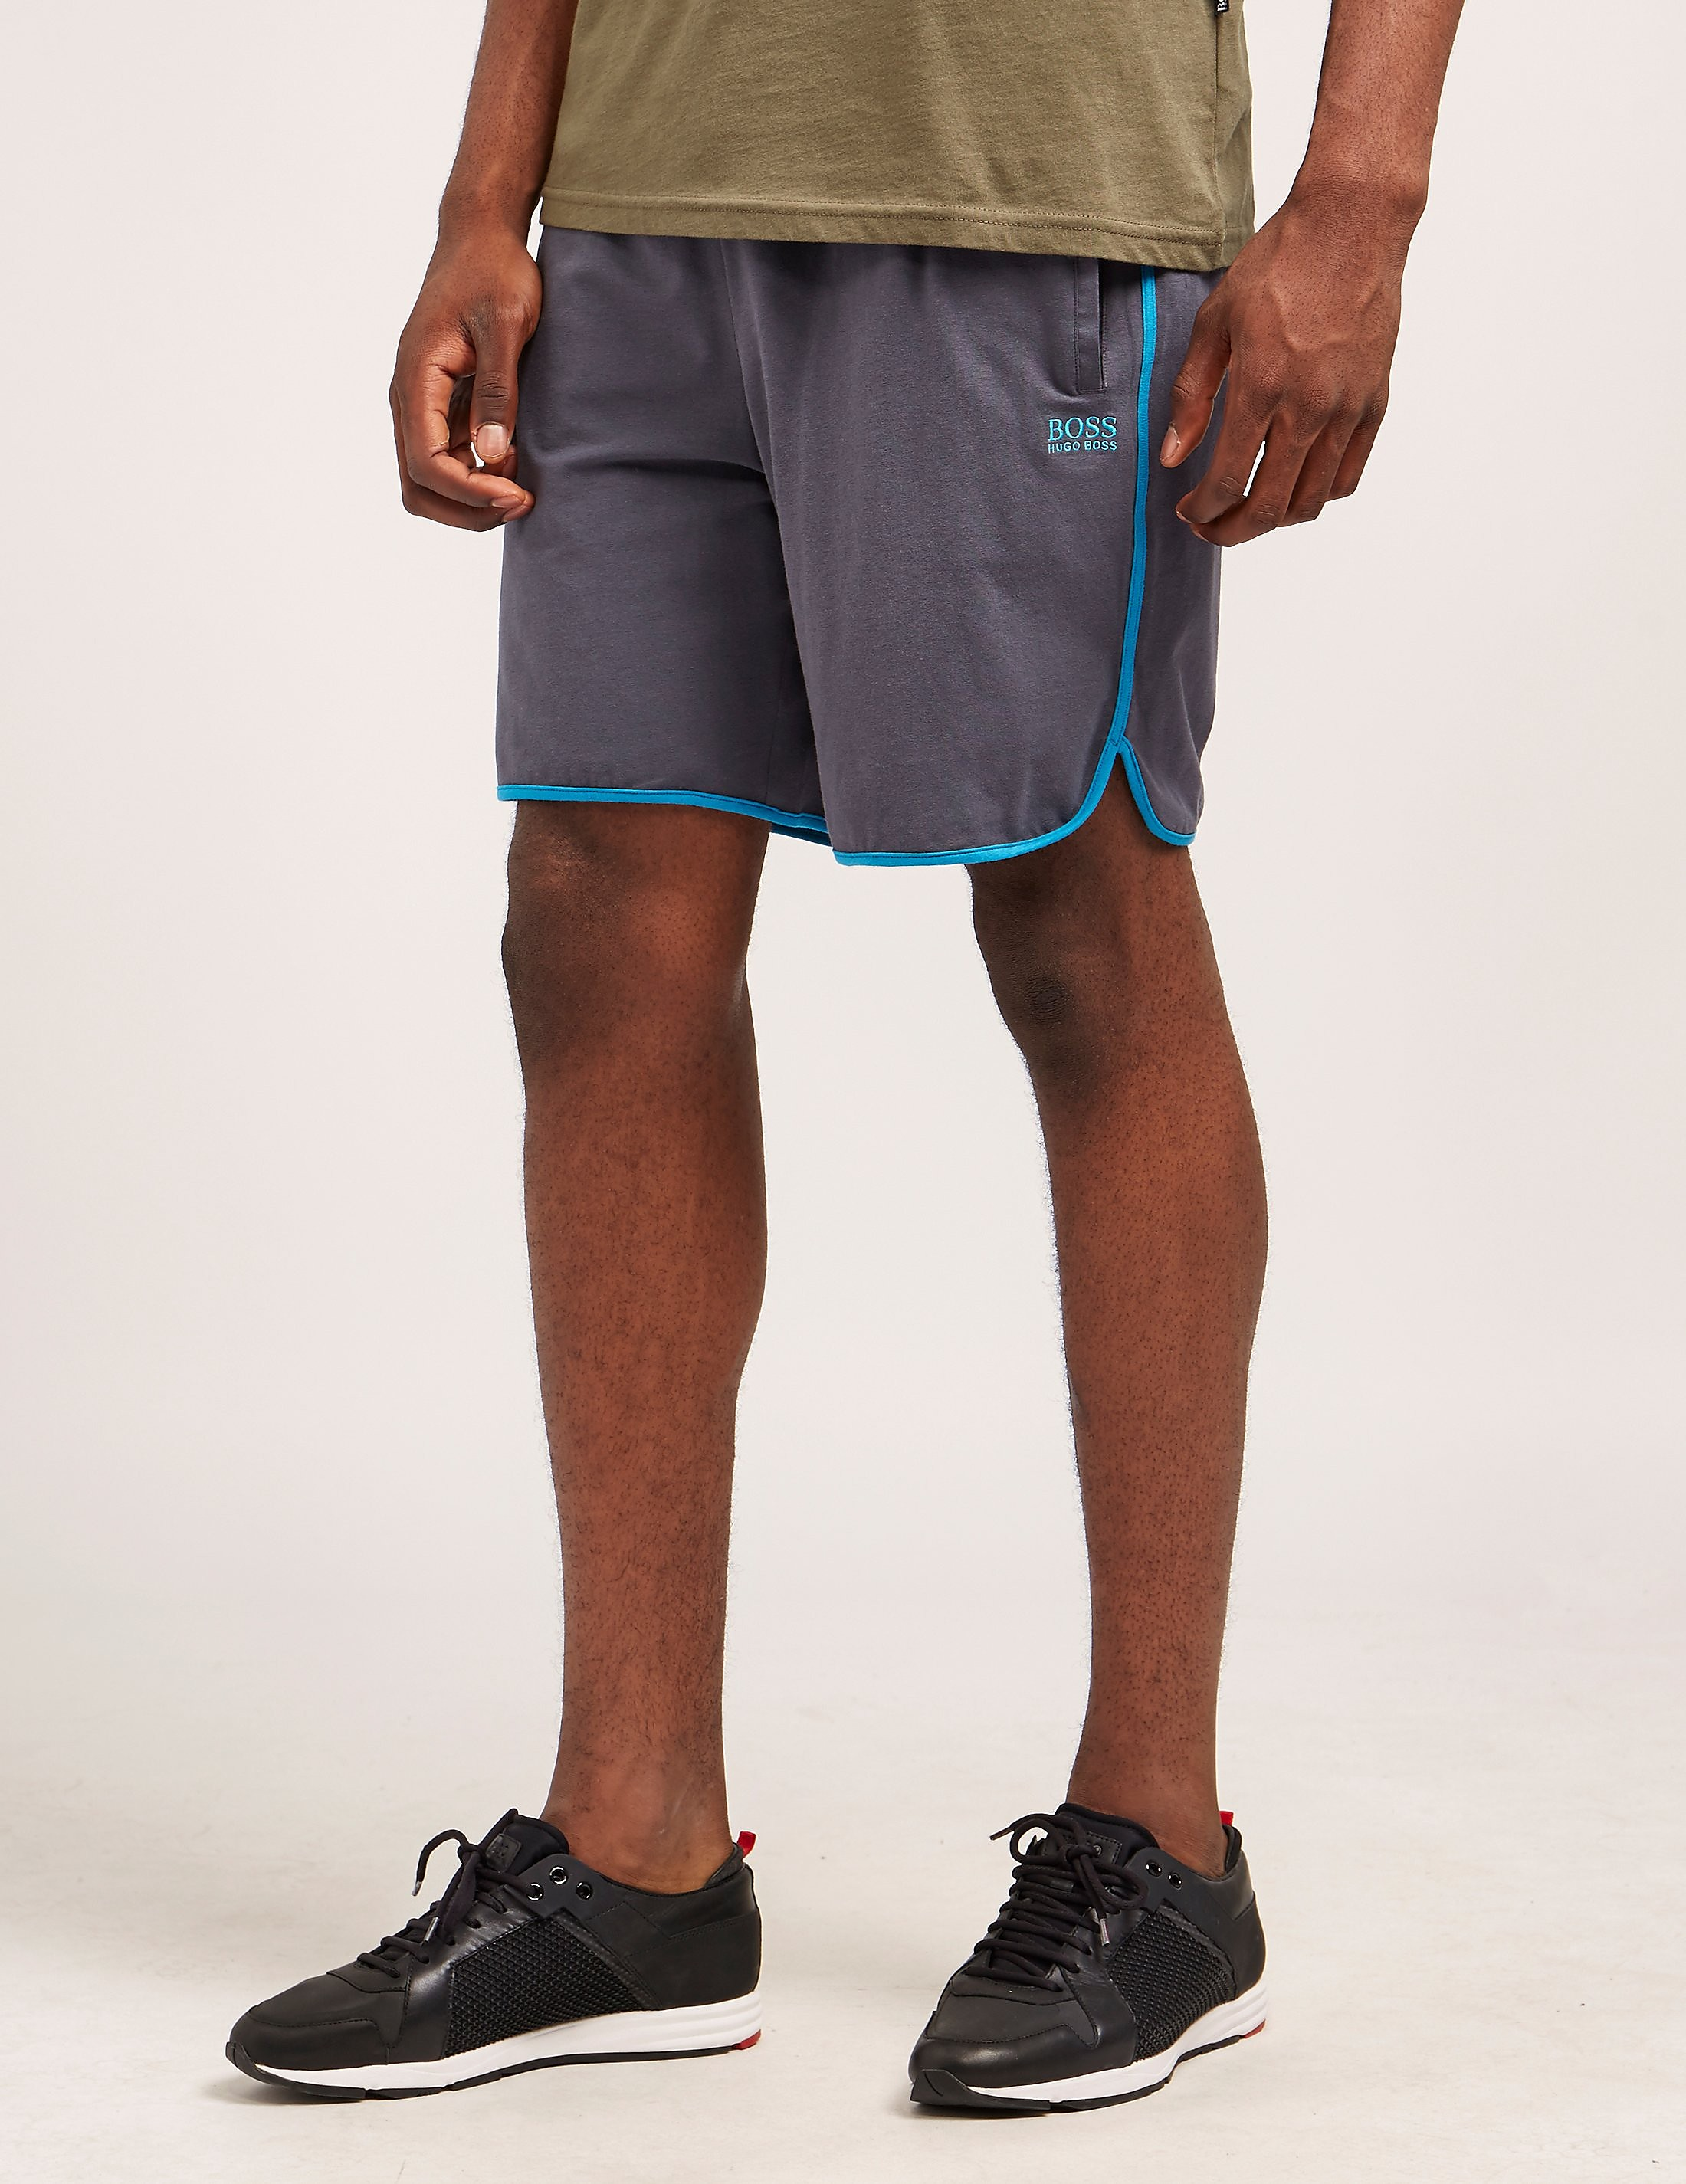 BOSS Logo Fleece Shorts